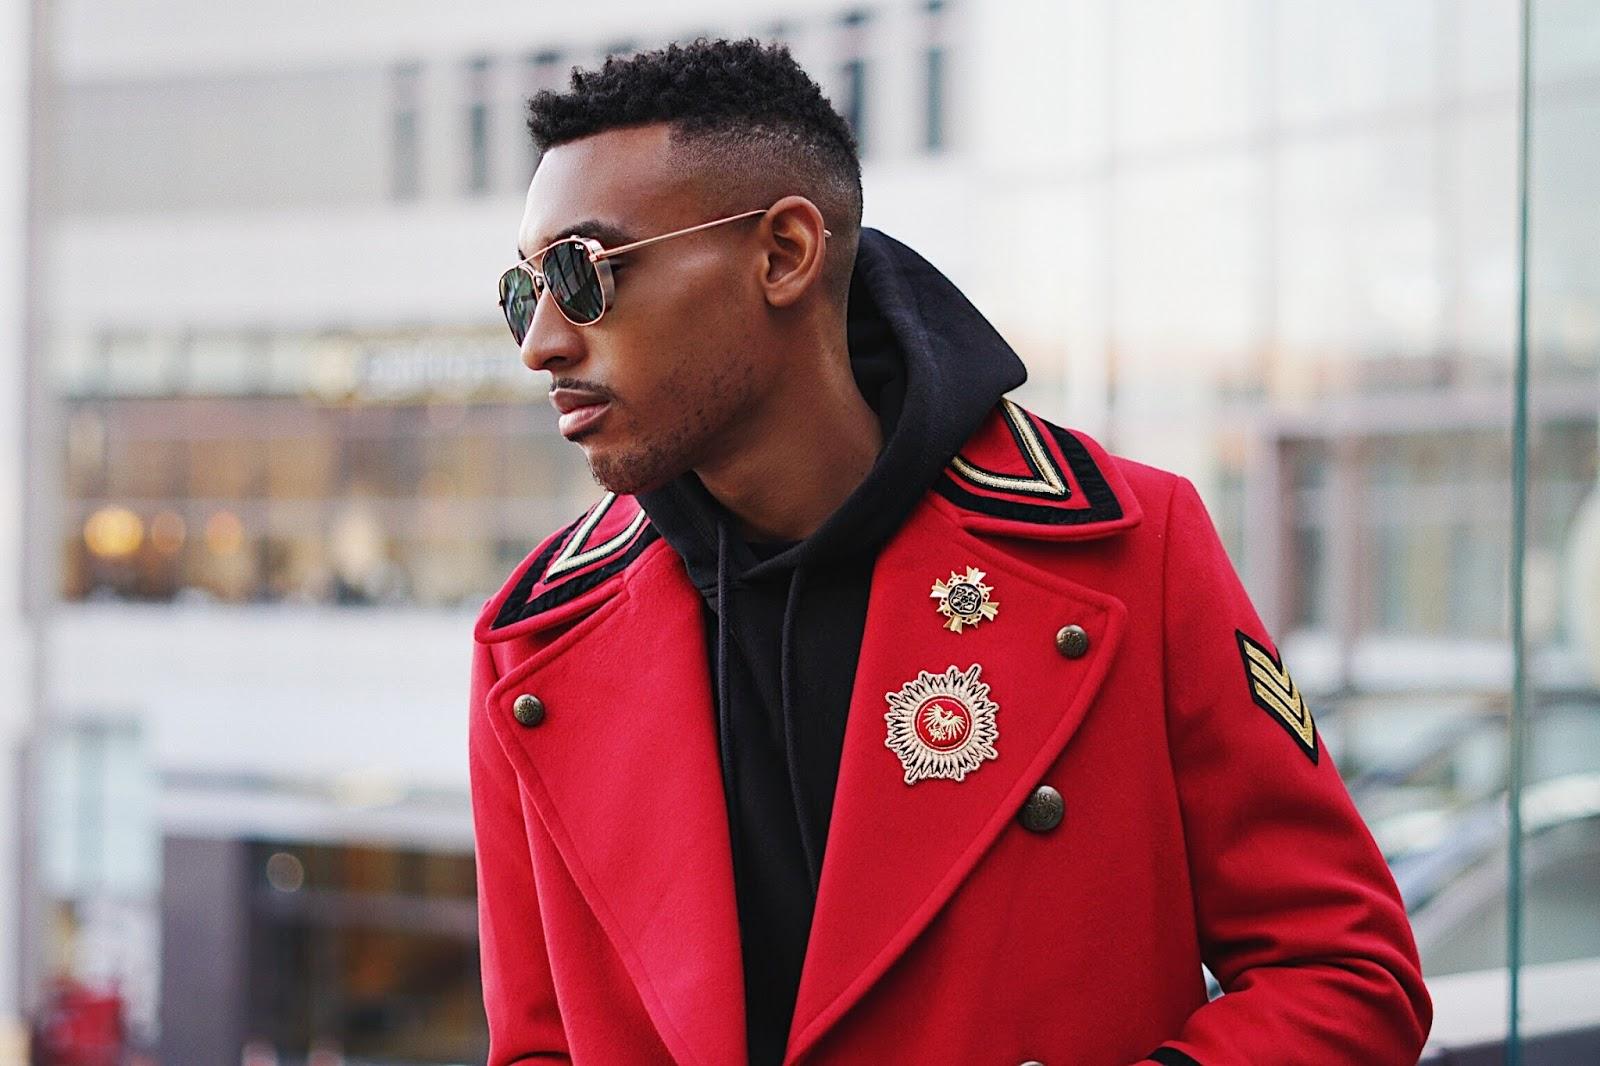 military coats men how to style a military coat zara men coats mens fashion mens style quay sunglasses